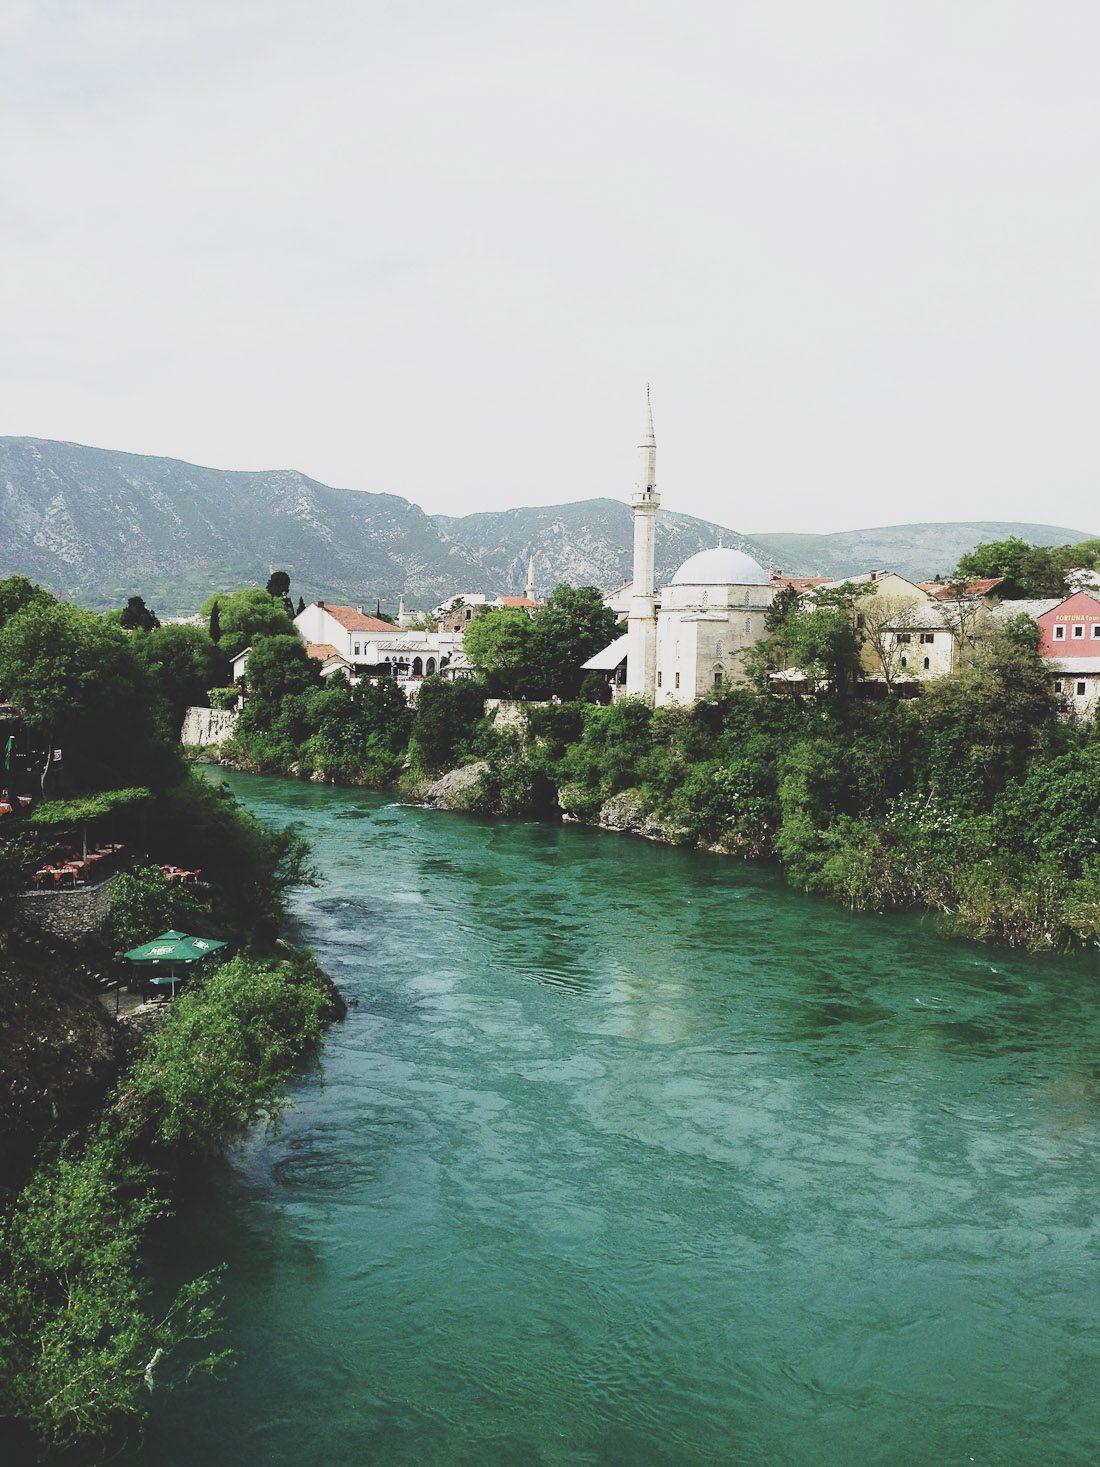 bosnia mostdar stari bridge eastern europe travel blue sea water bridge photo shershegoes.com